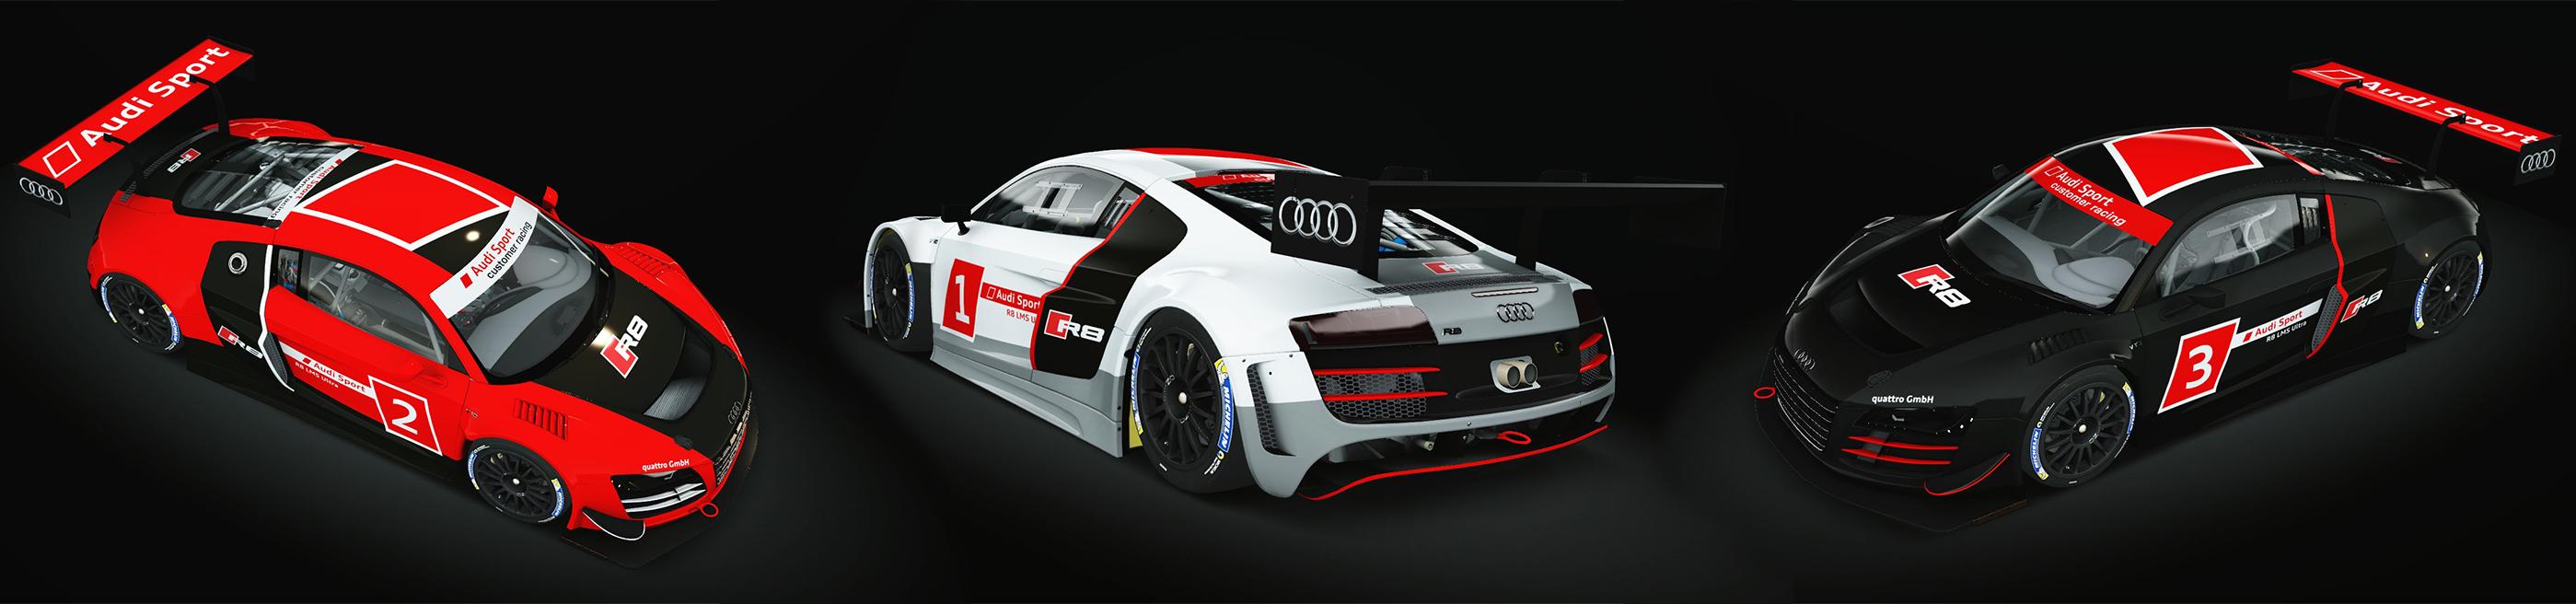 Audi-Sport-Skinpack2.jpg